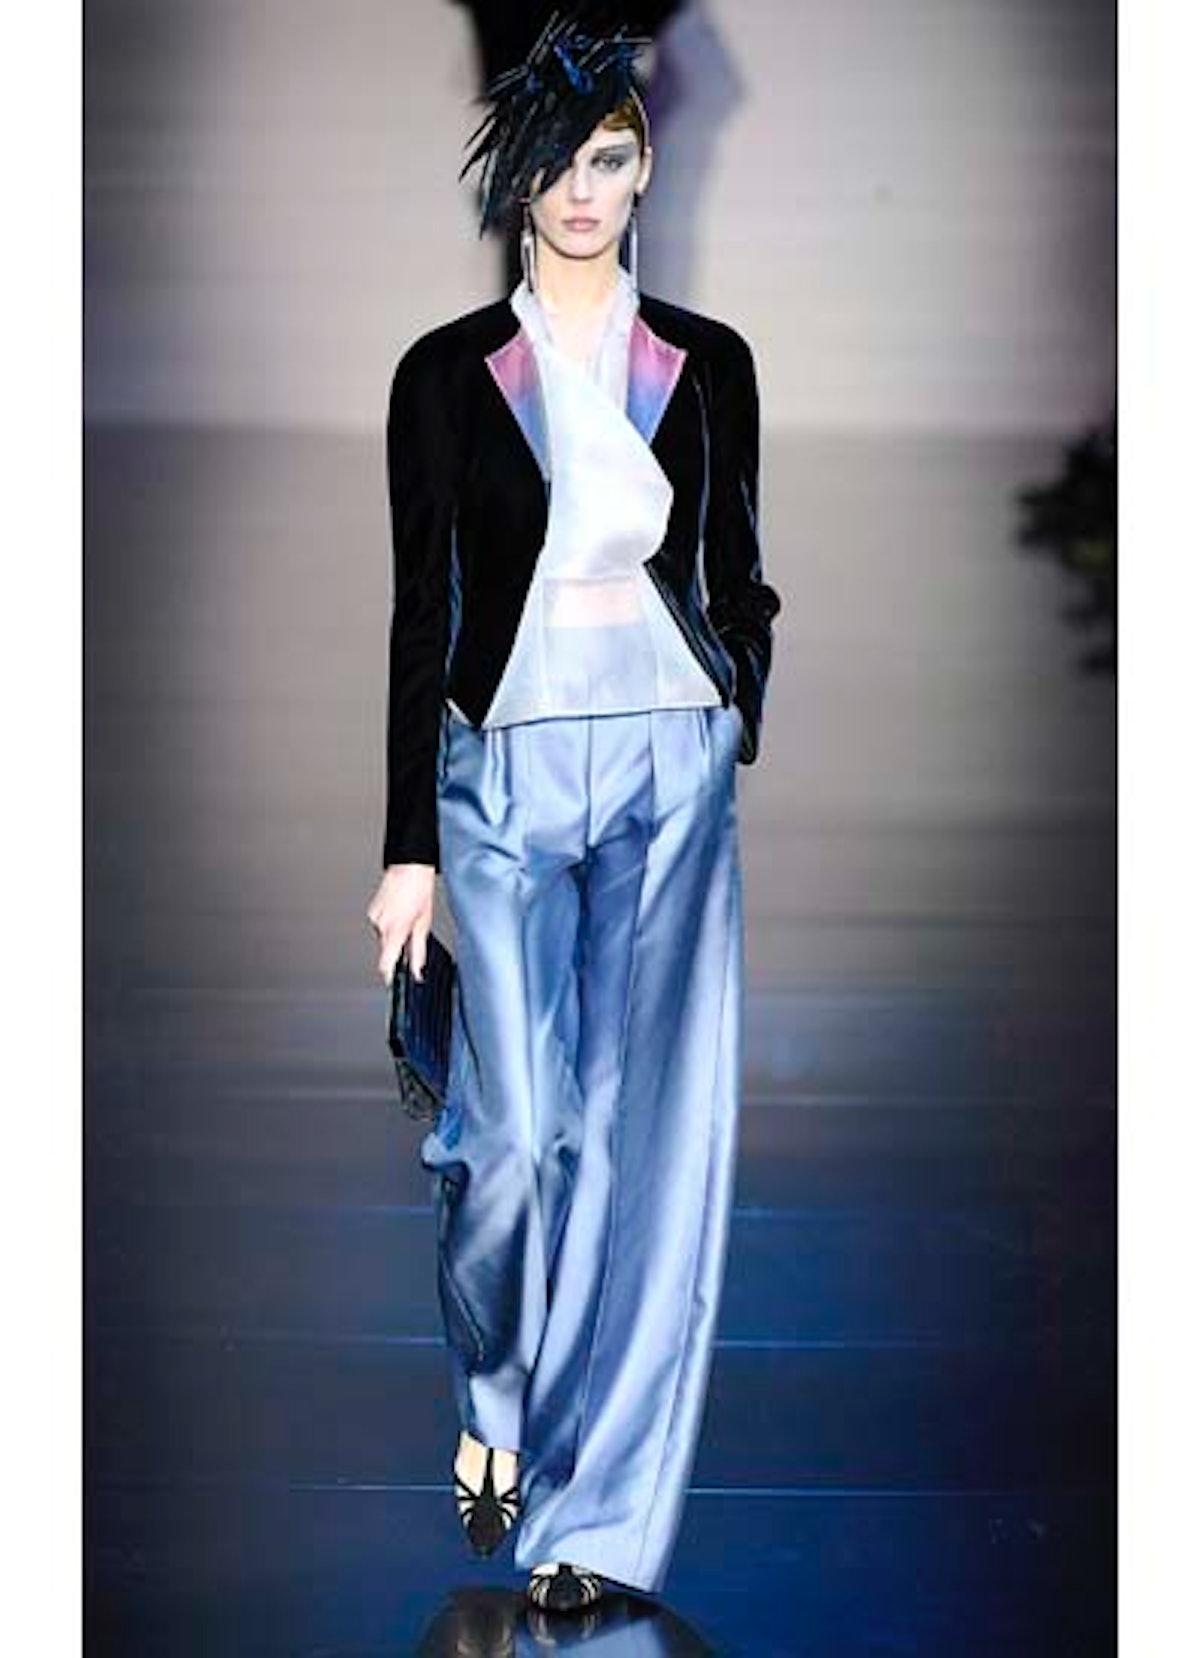 fass-giorgio-armani-couture-2012-runway-31-v.jpg